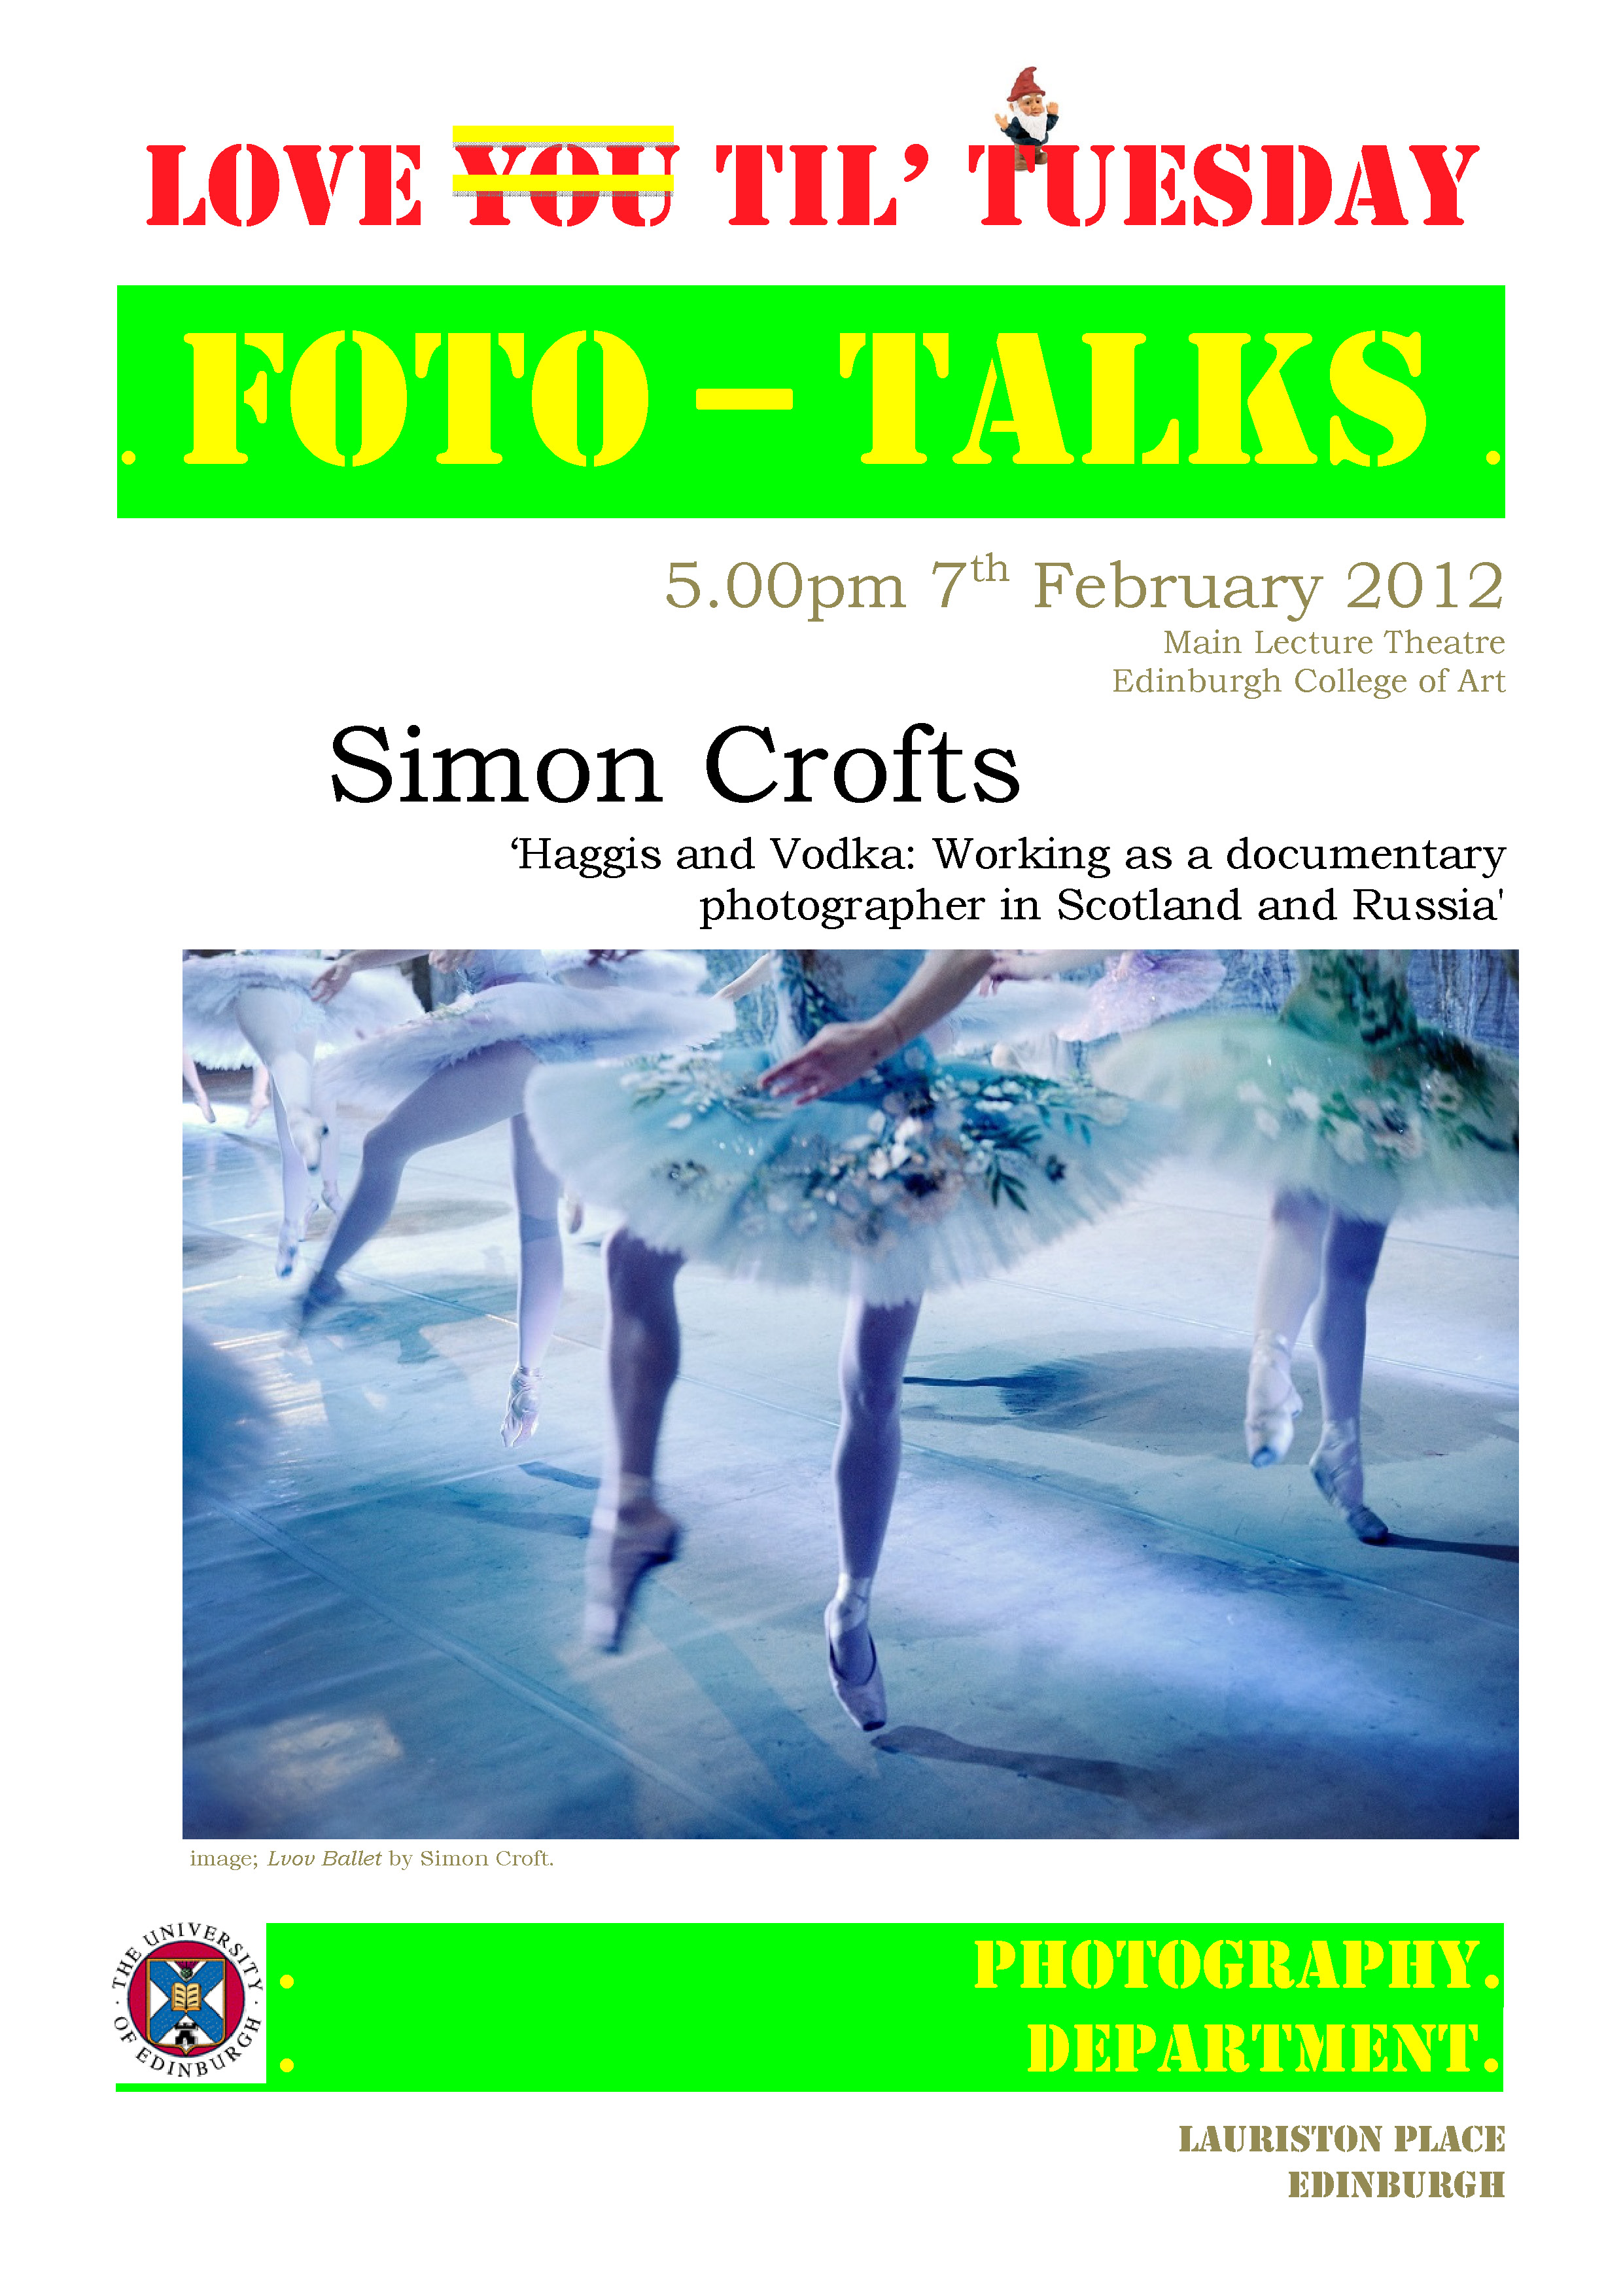 Open Photography Talk -Simon